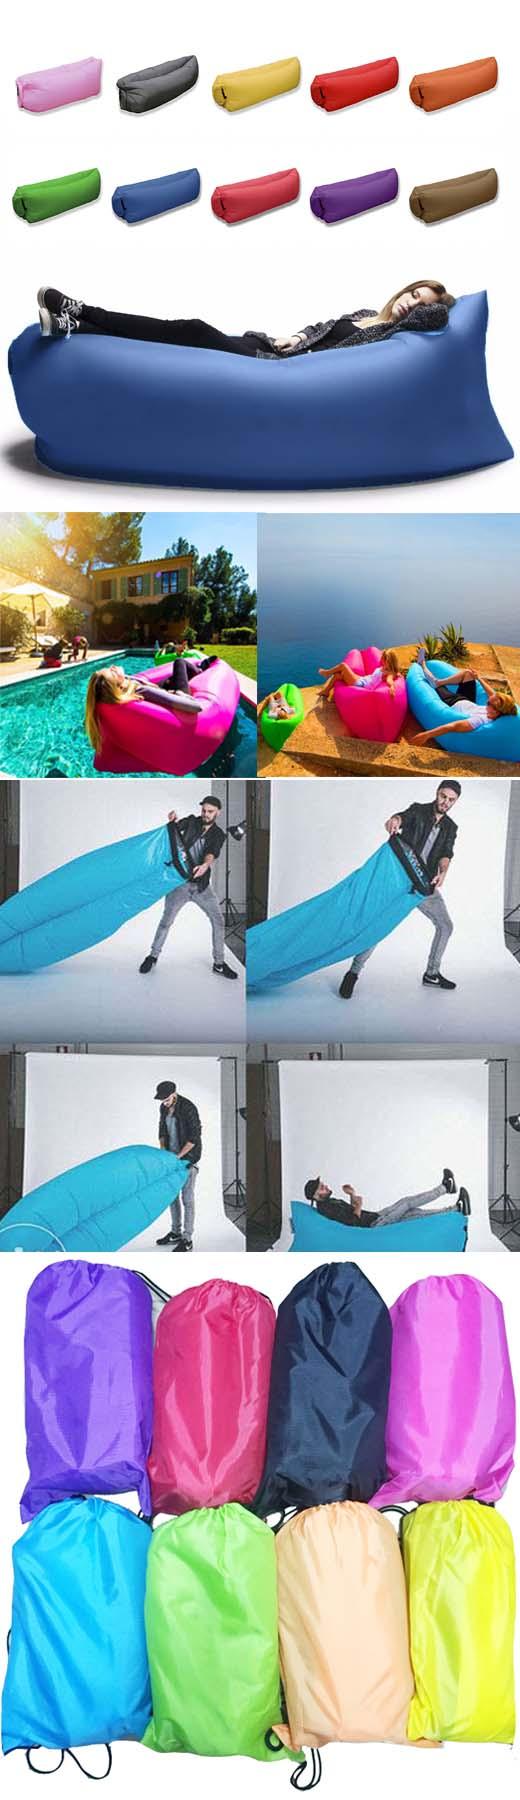 lazy-bag